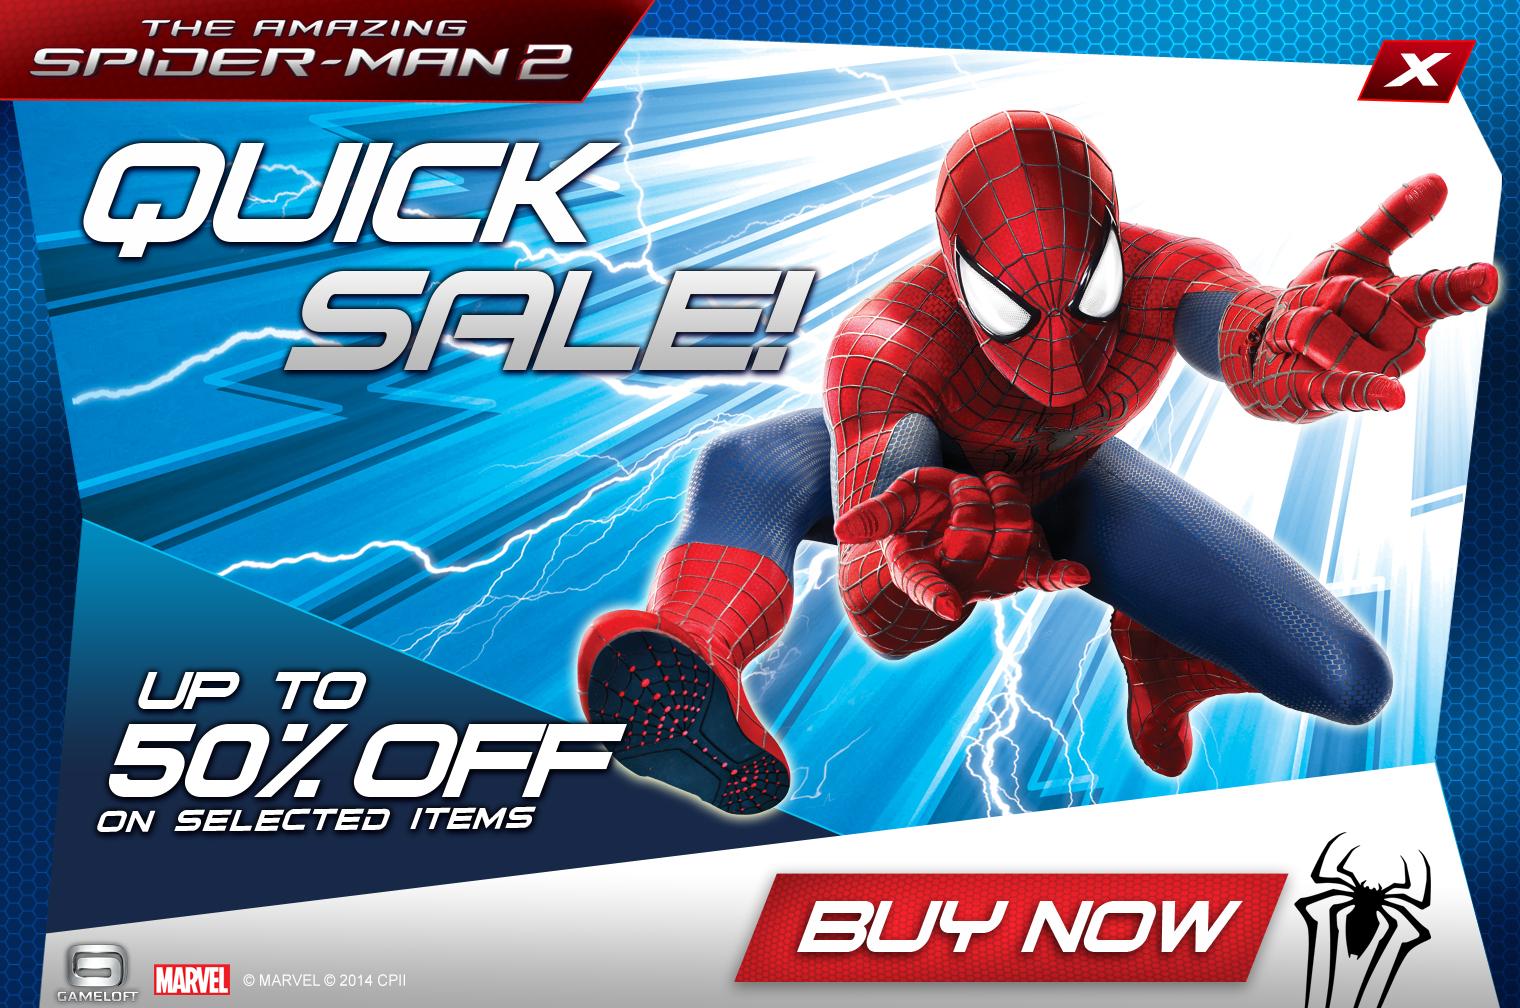 Marvel_AMZ_Spiderman_2_Design_V3